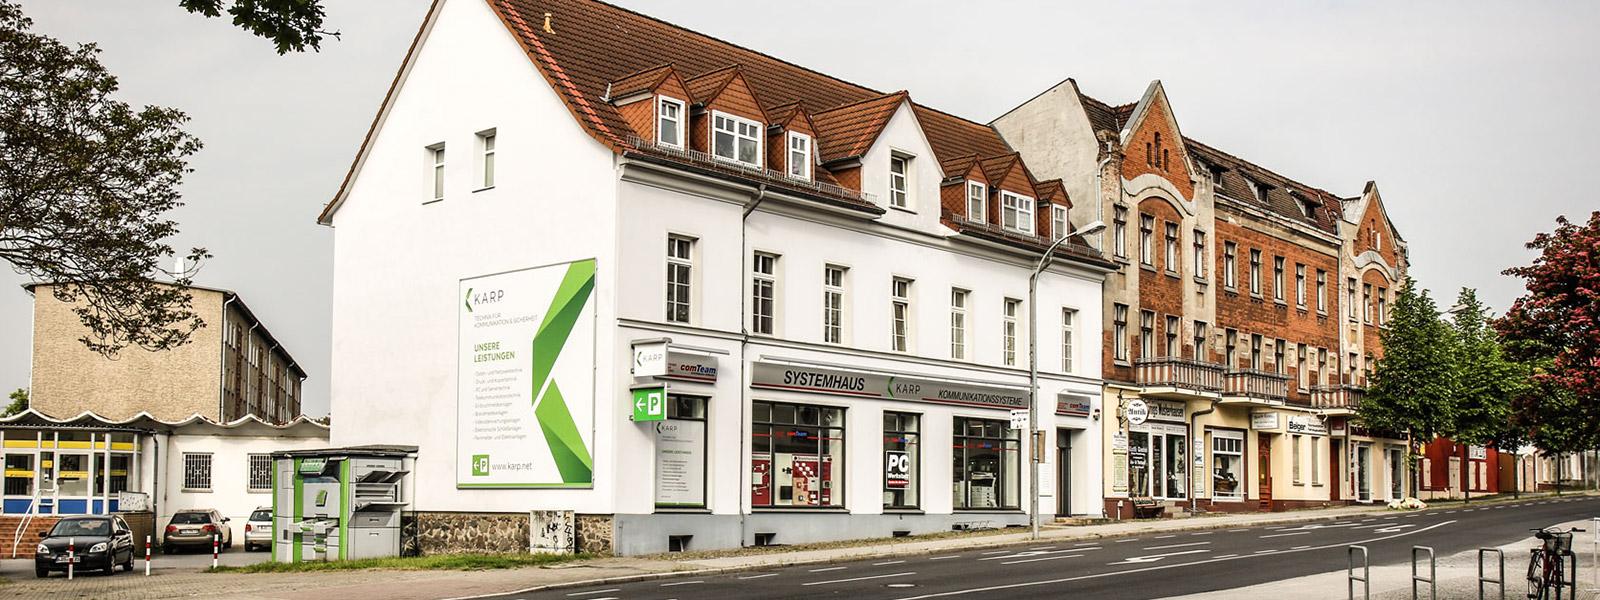 Karp GmbH Ausstellung Königs Wusterhausen